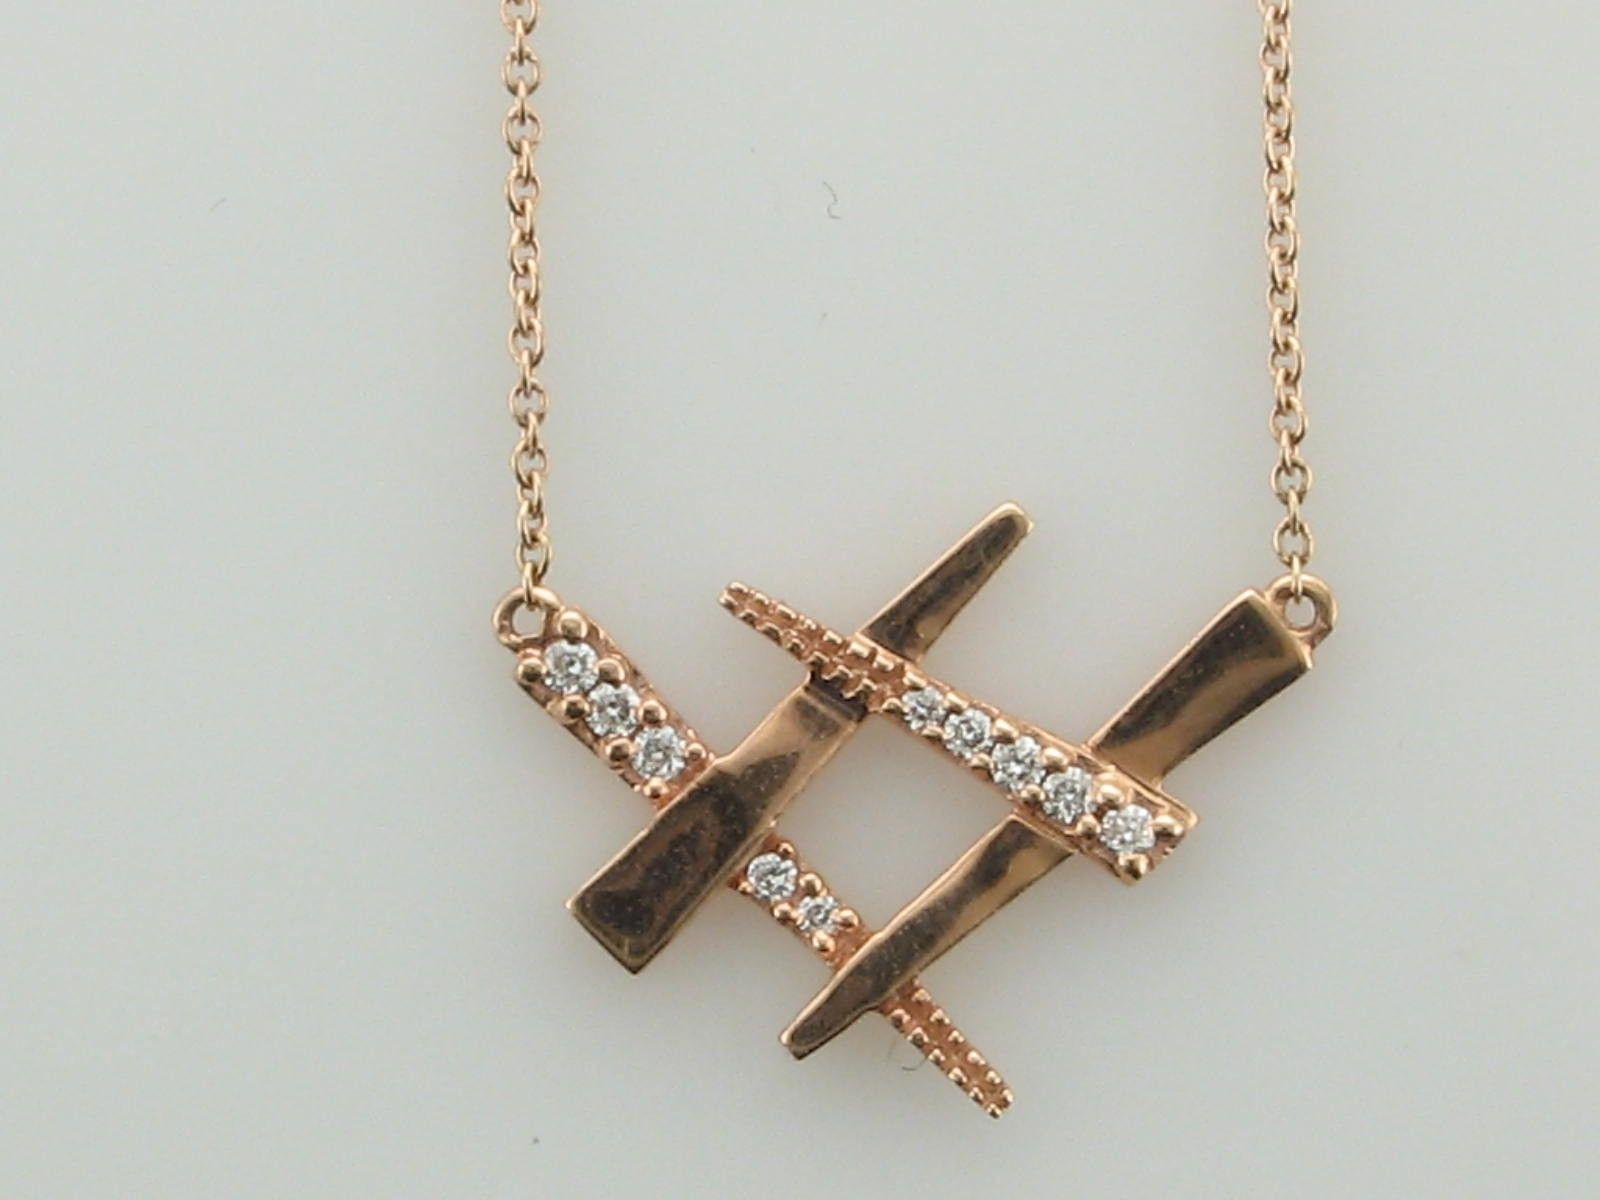 Diamond Criss Cross Necklace from UniQ Jewelry